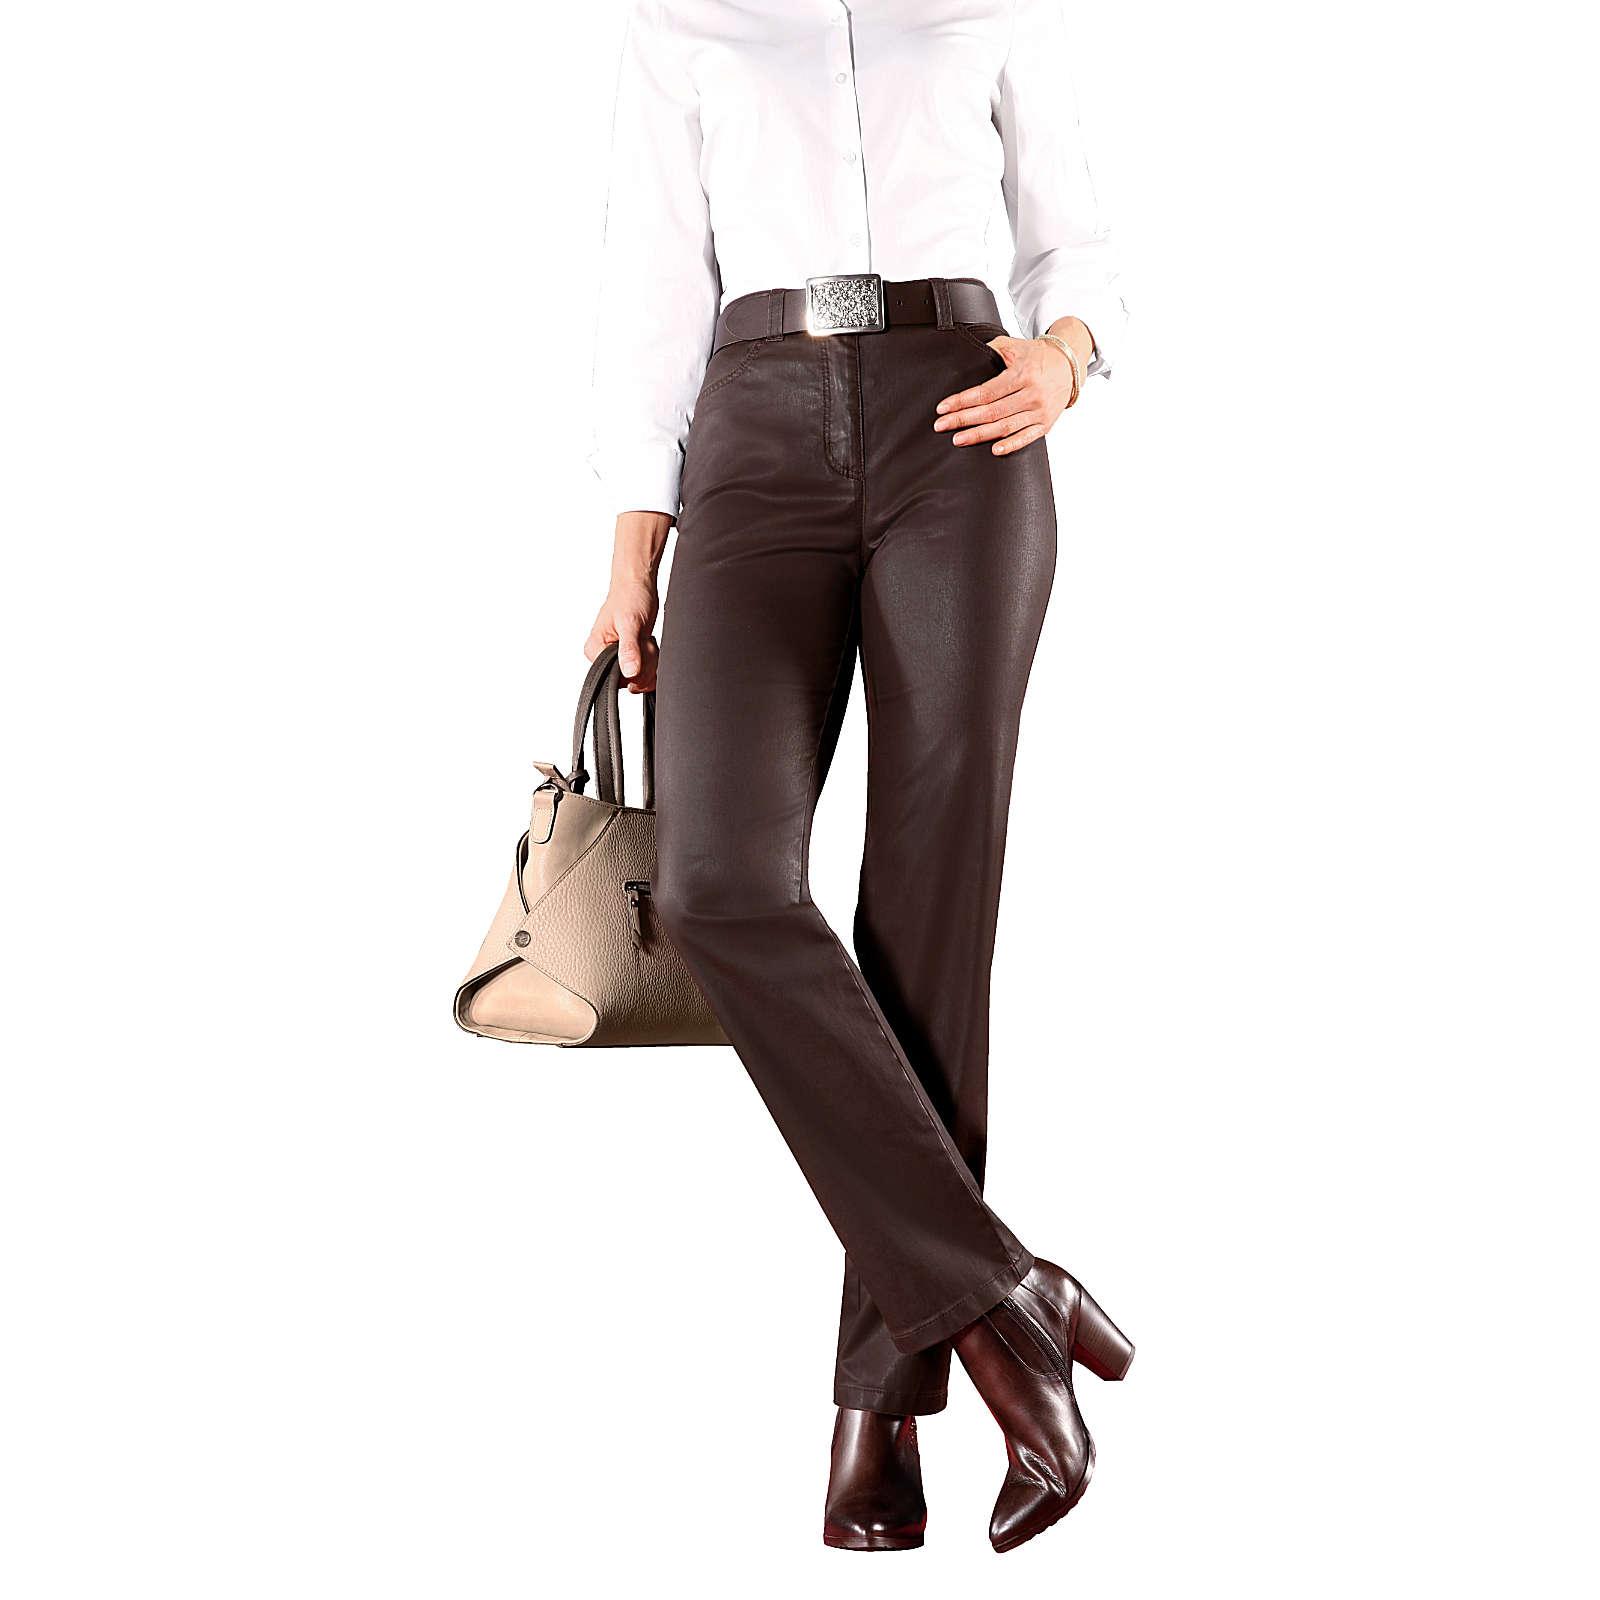 TONI 5-Pocket-Hose braun Damen Gr. 24